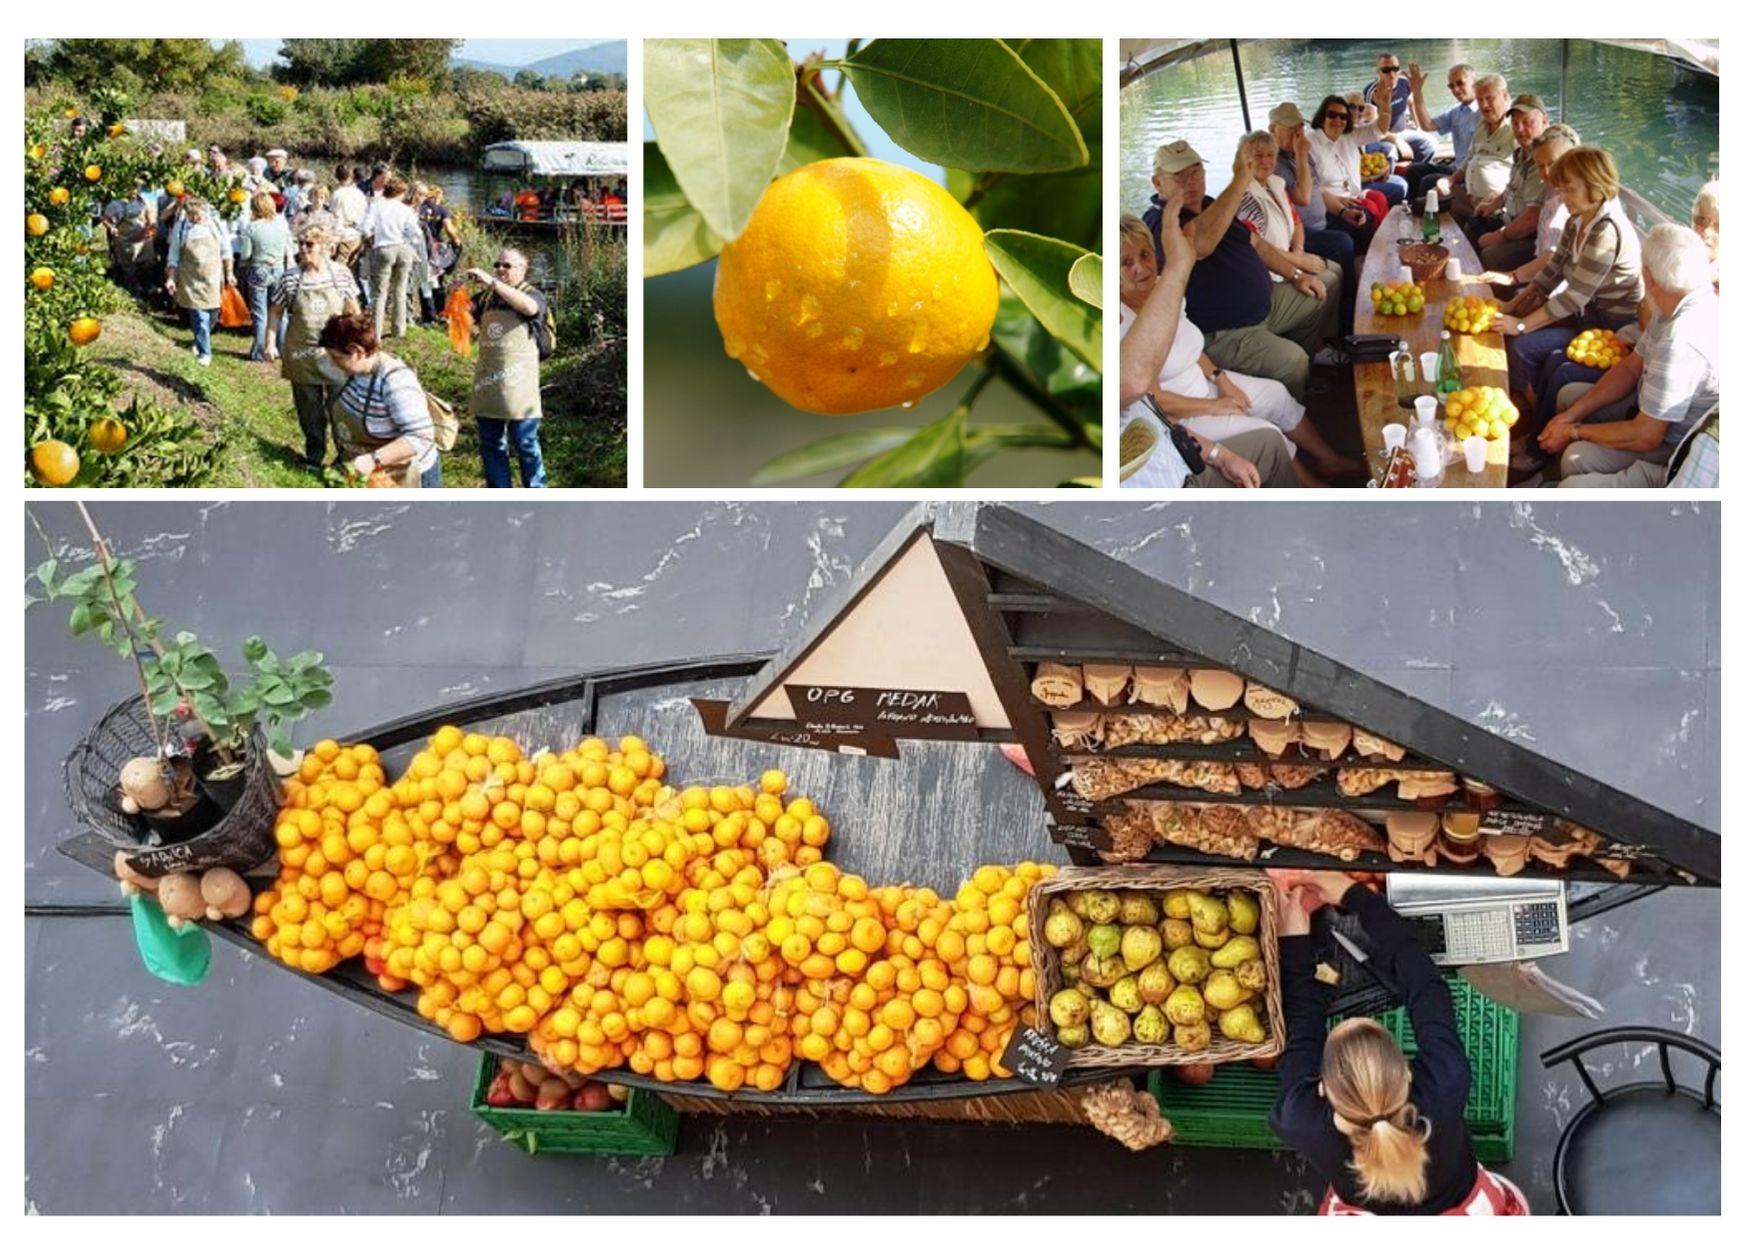 mandarine i turizam